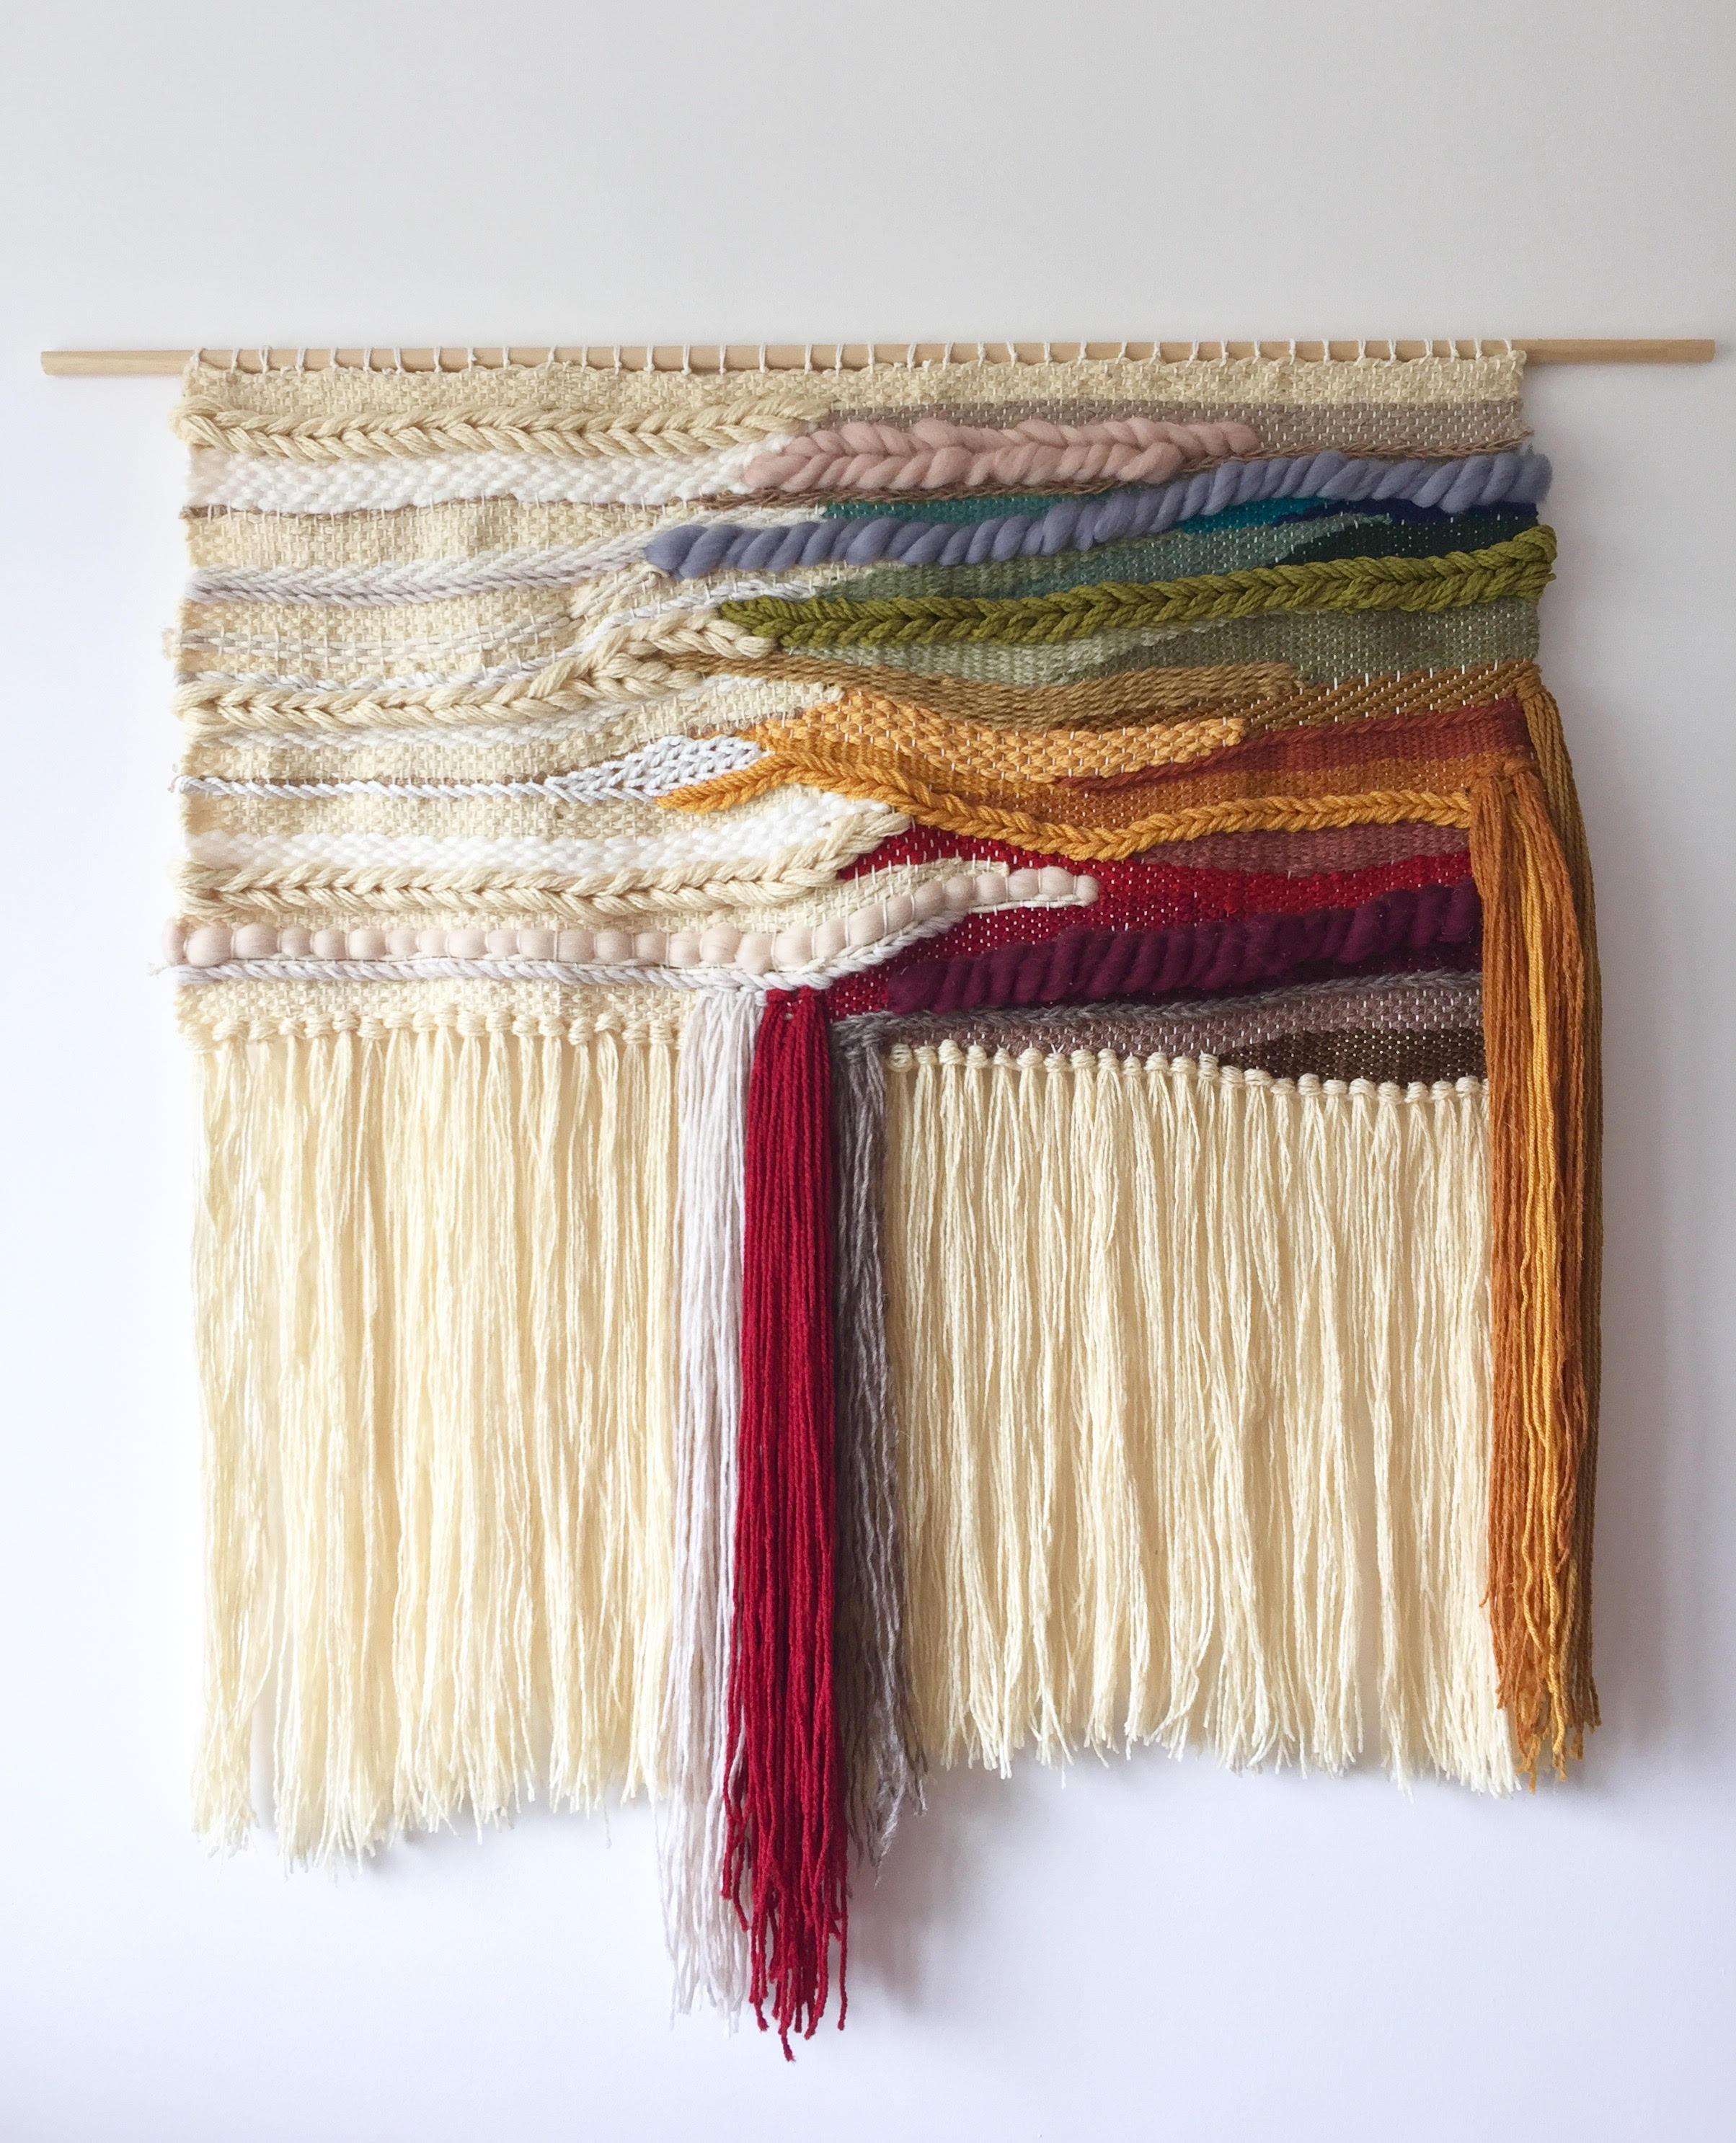 Paper_and_Moon_Louise_Dockery_interior_design_Dublin_Ireland_wall_hanging_macrame_weaving_Weaverella_Emma_Carroll.jpg